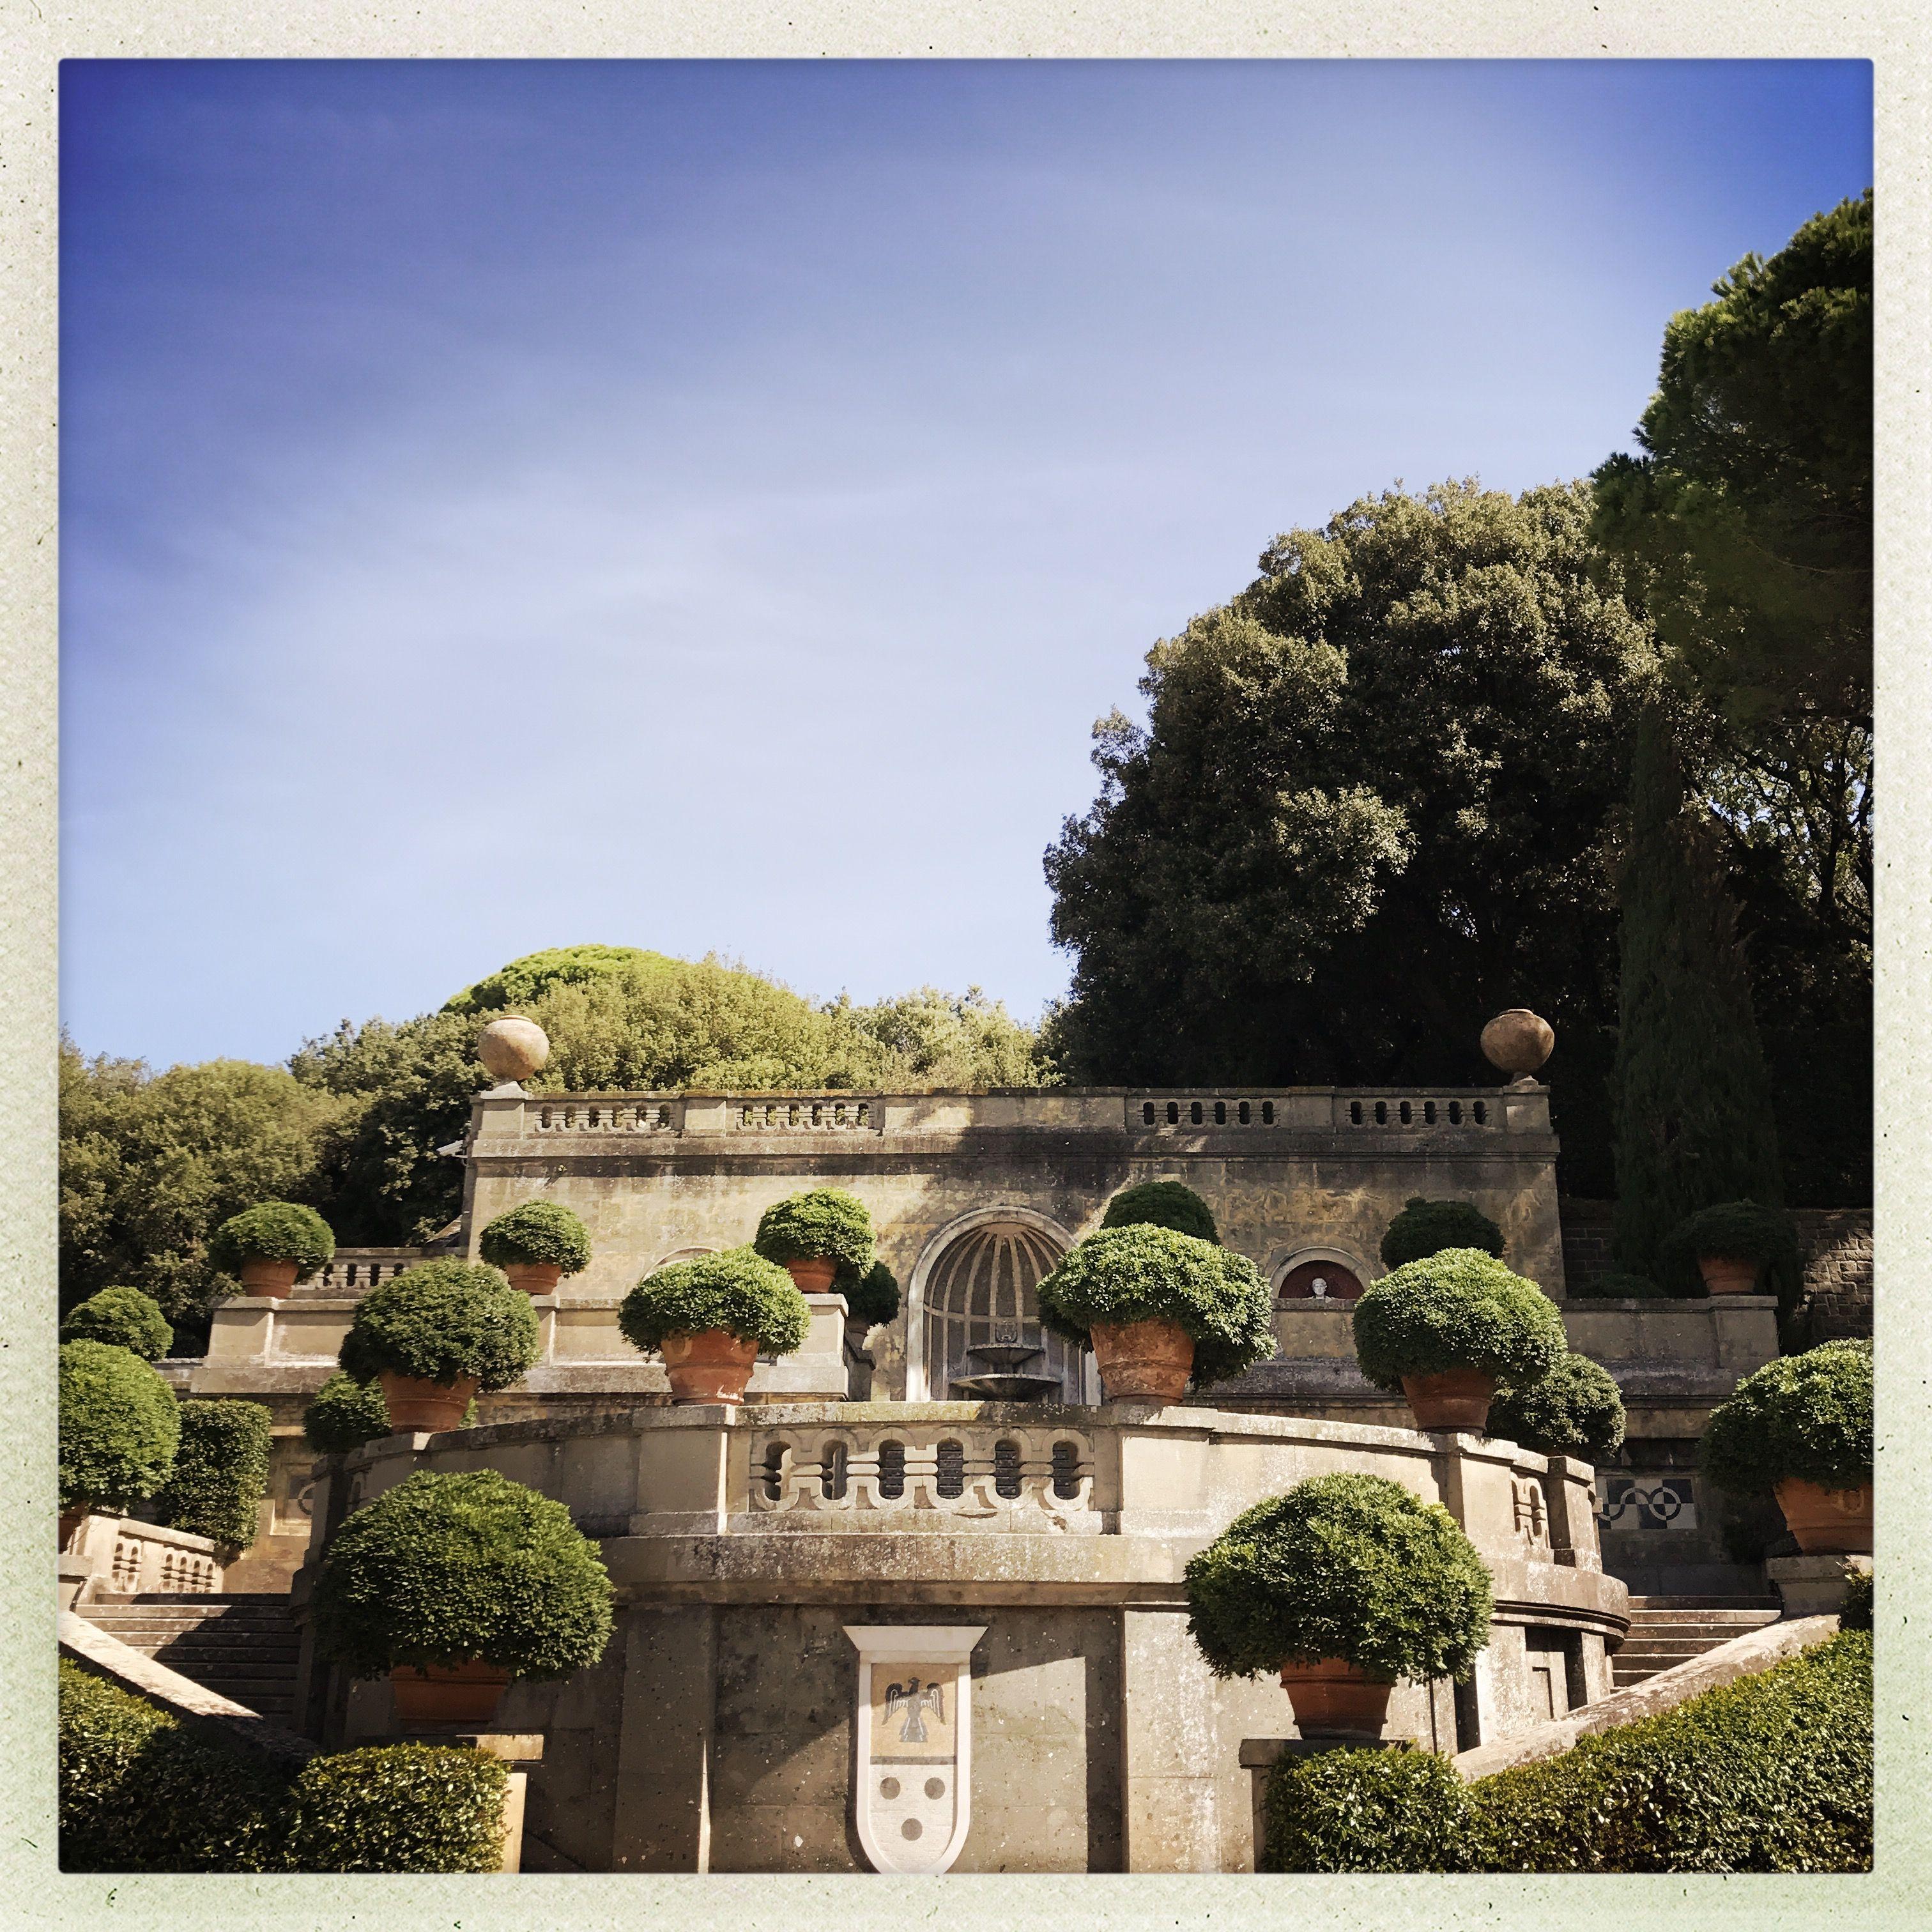 80ace51f6ef9f590180497c0a05d0a5c - Barberini Gardens Of The Pontifical Villas